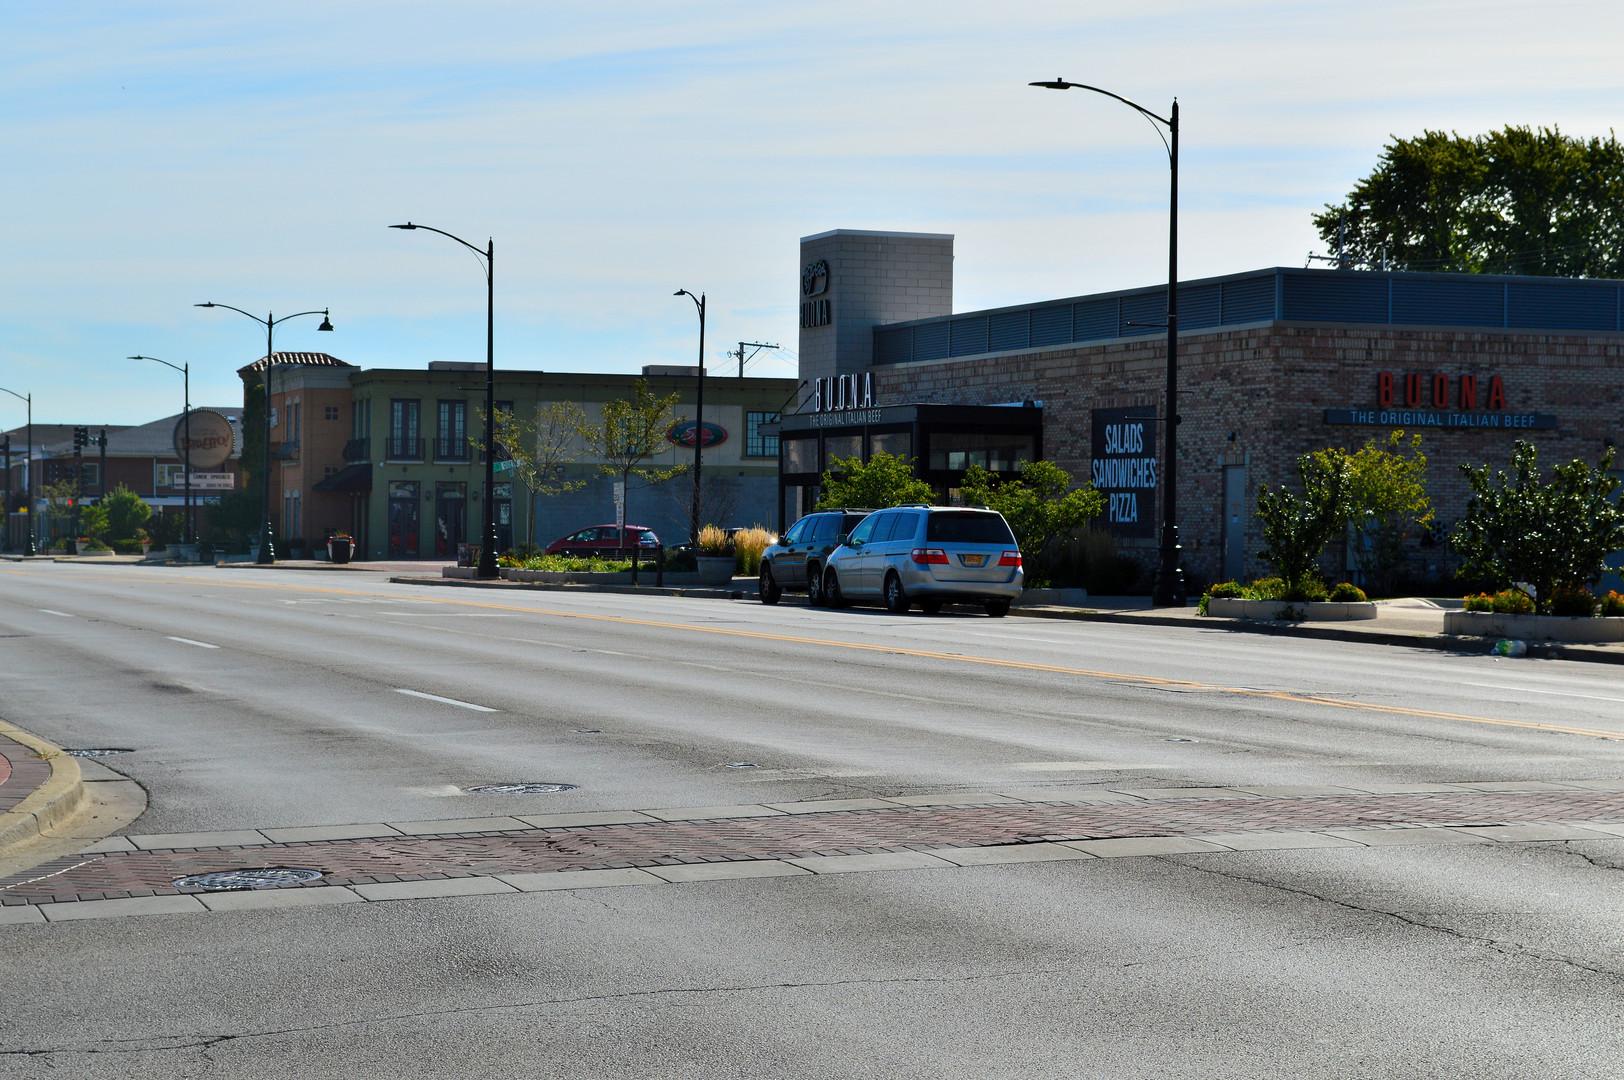 7420 Lawrence Unit Unit 102 ,Harwood Heights, Illinois 60706